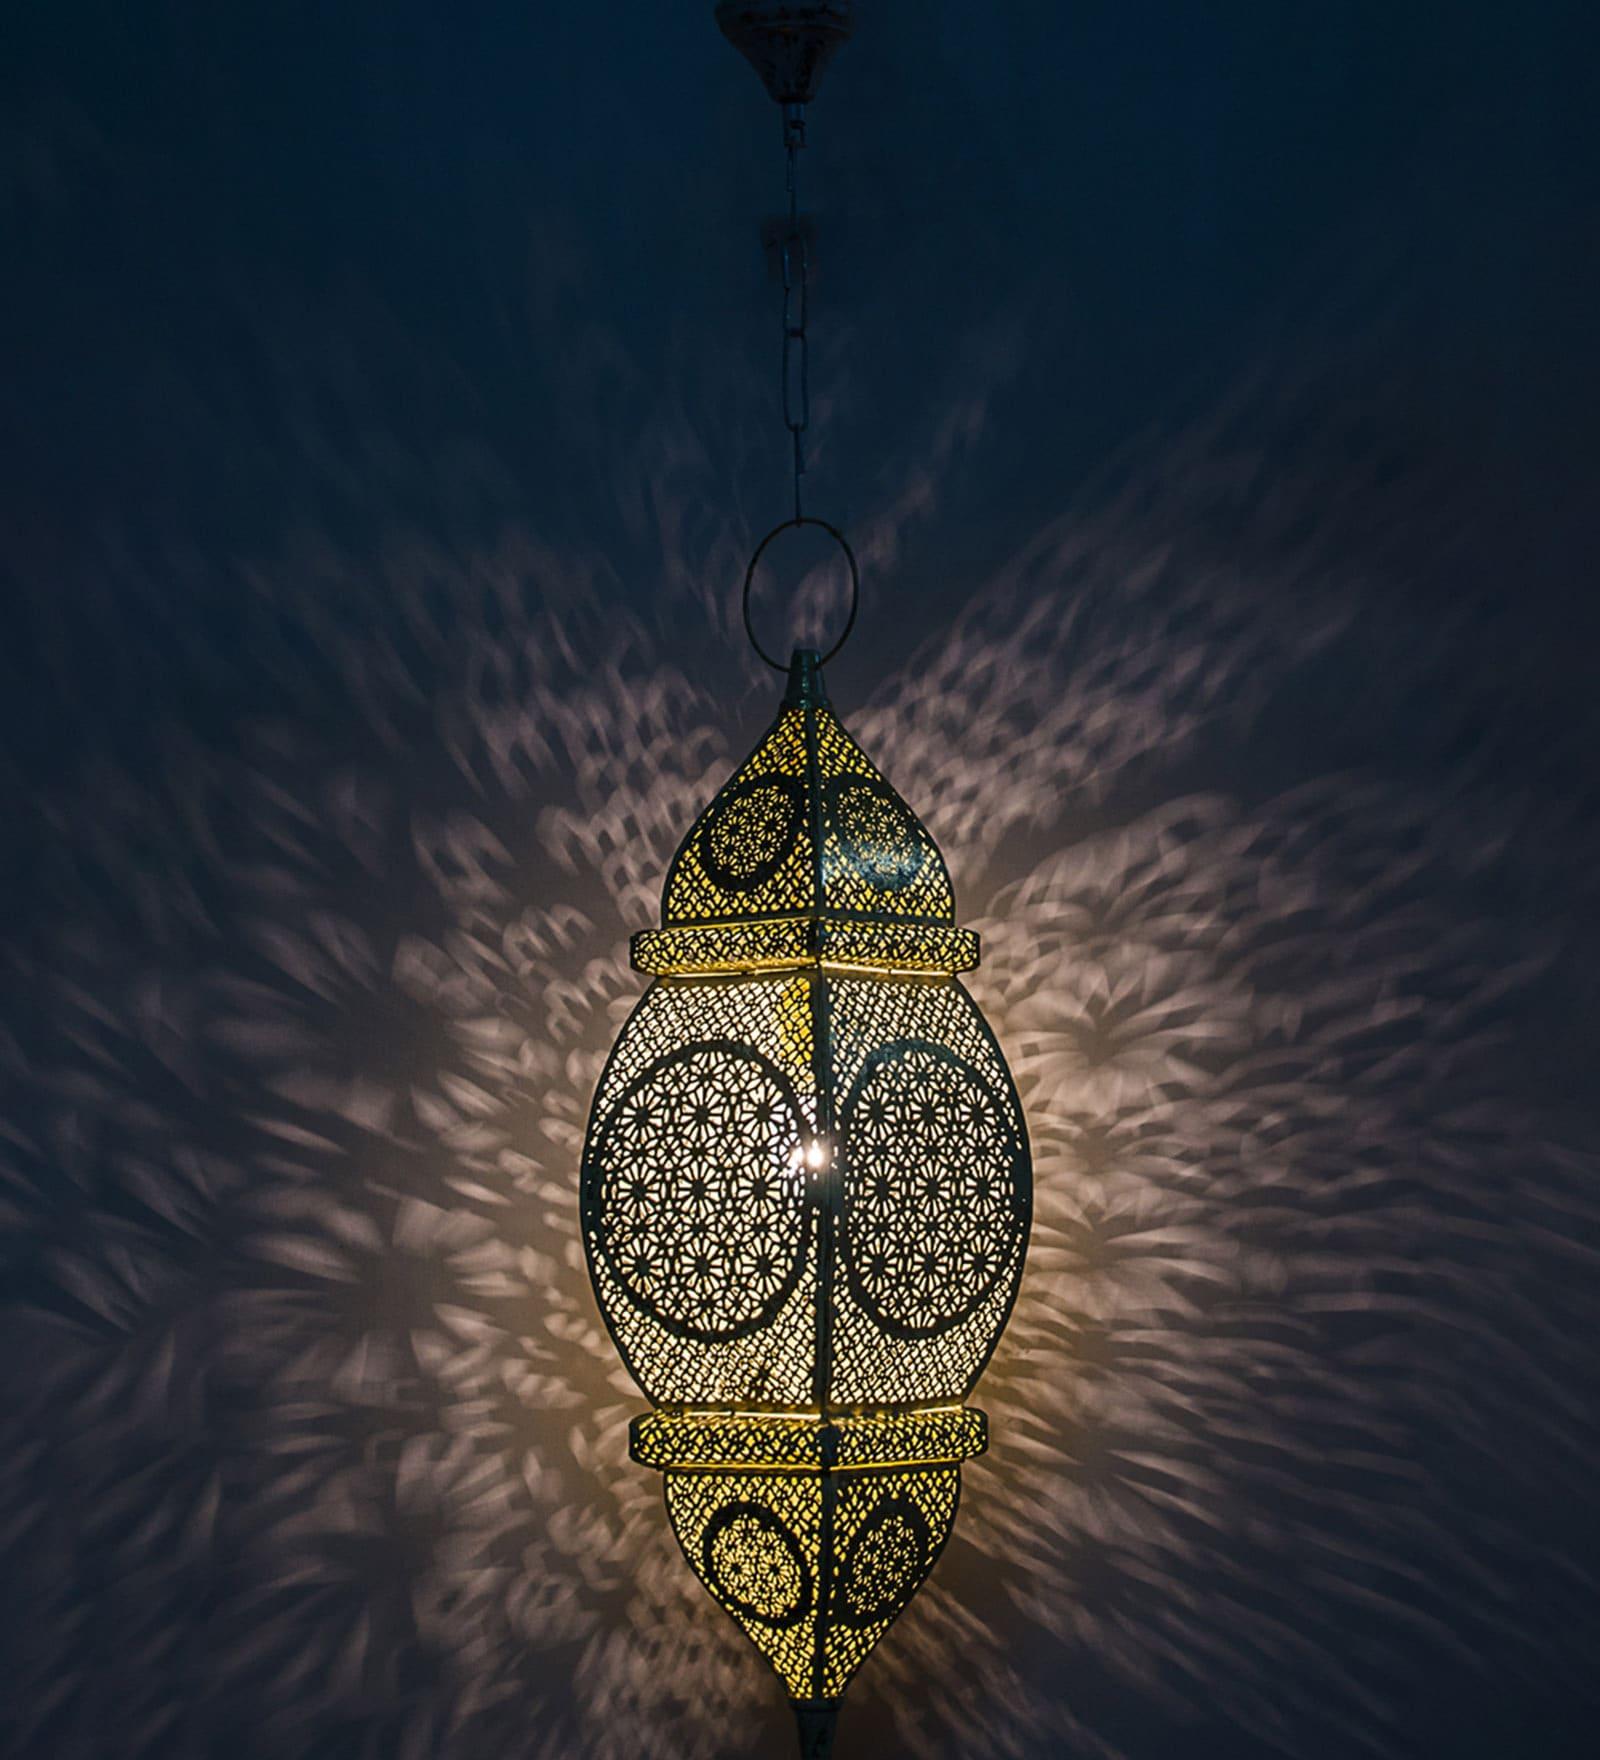 Orange & Gold Steel Hanging Light by Fos Lighting